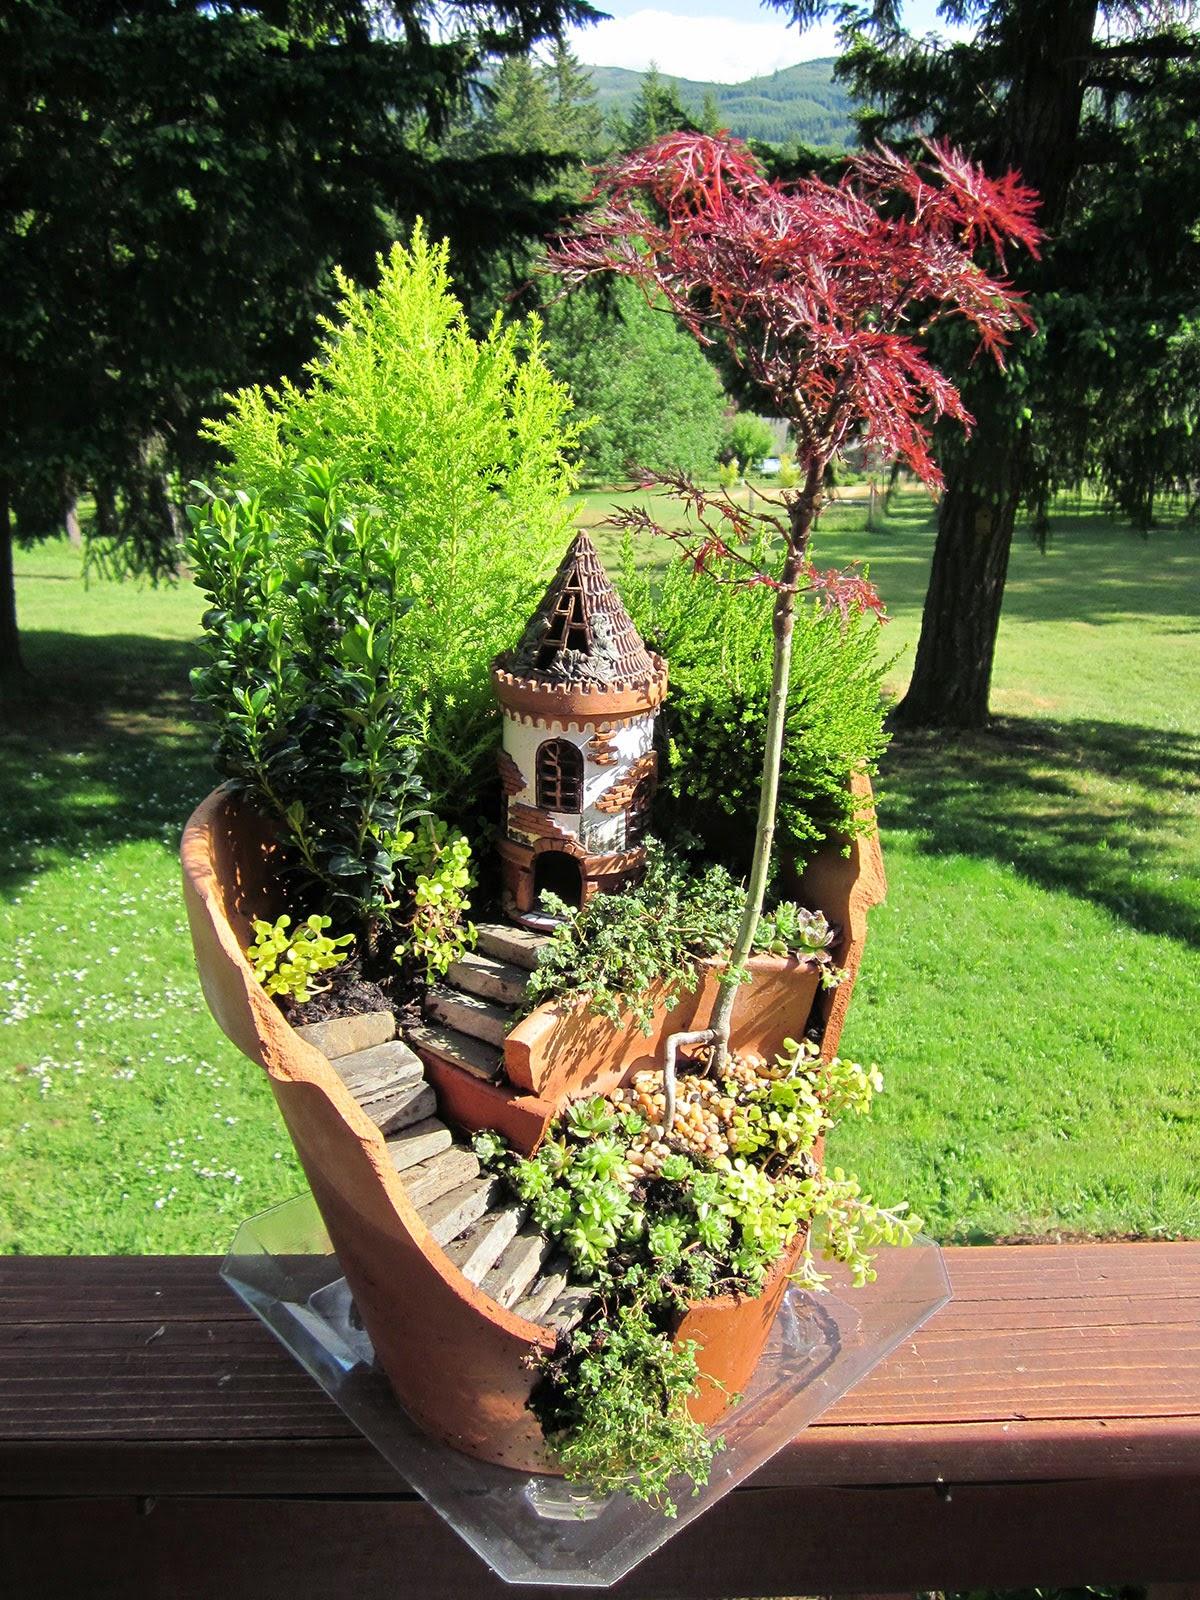 Robust 2018 Homemade Fairy Garden Items Sky Diy Miniature Fairy Garden Ideas Castle garden Homemade Fairy Garden Items